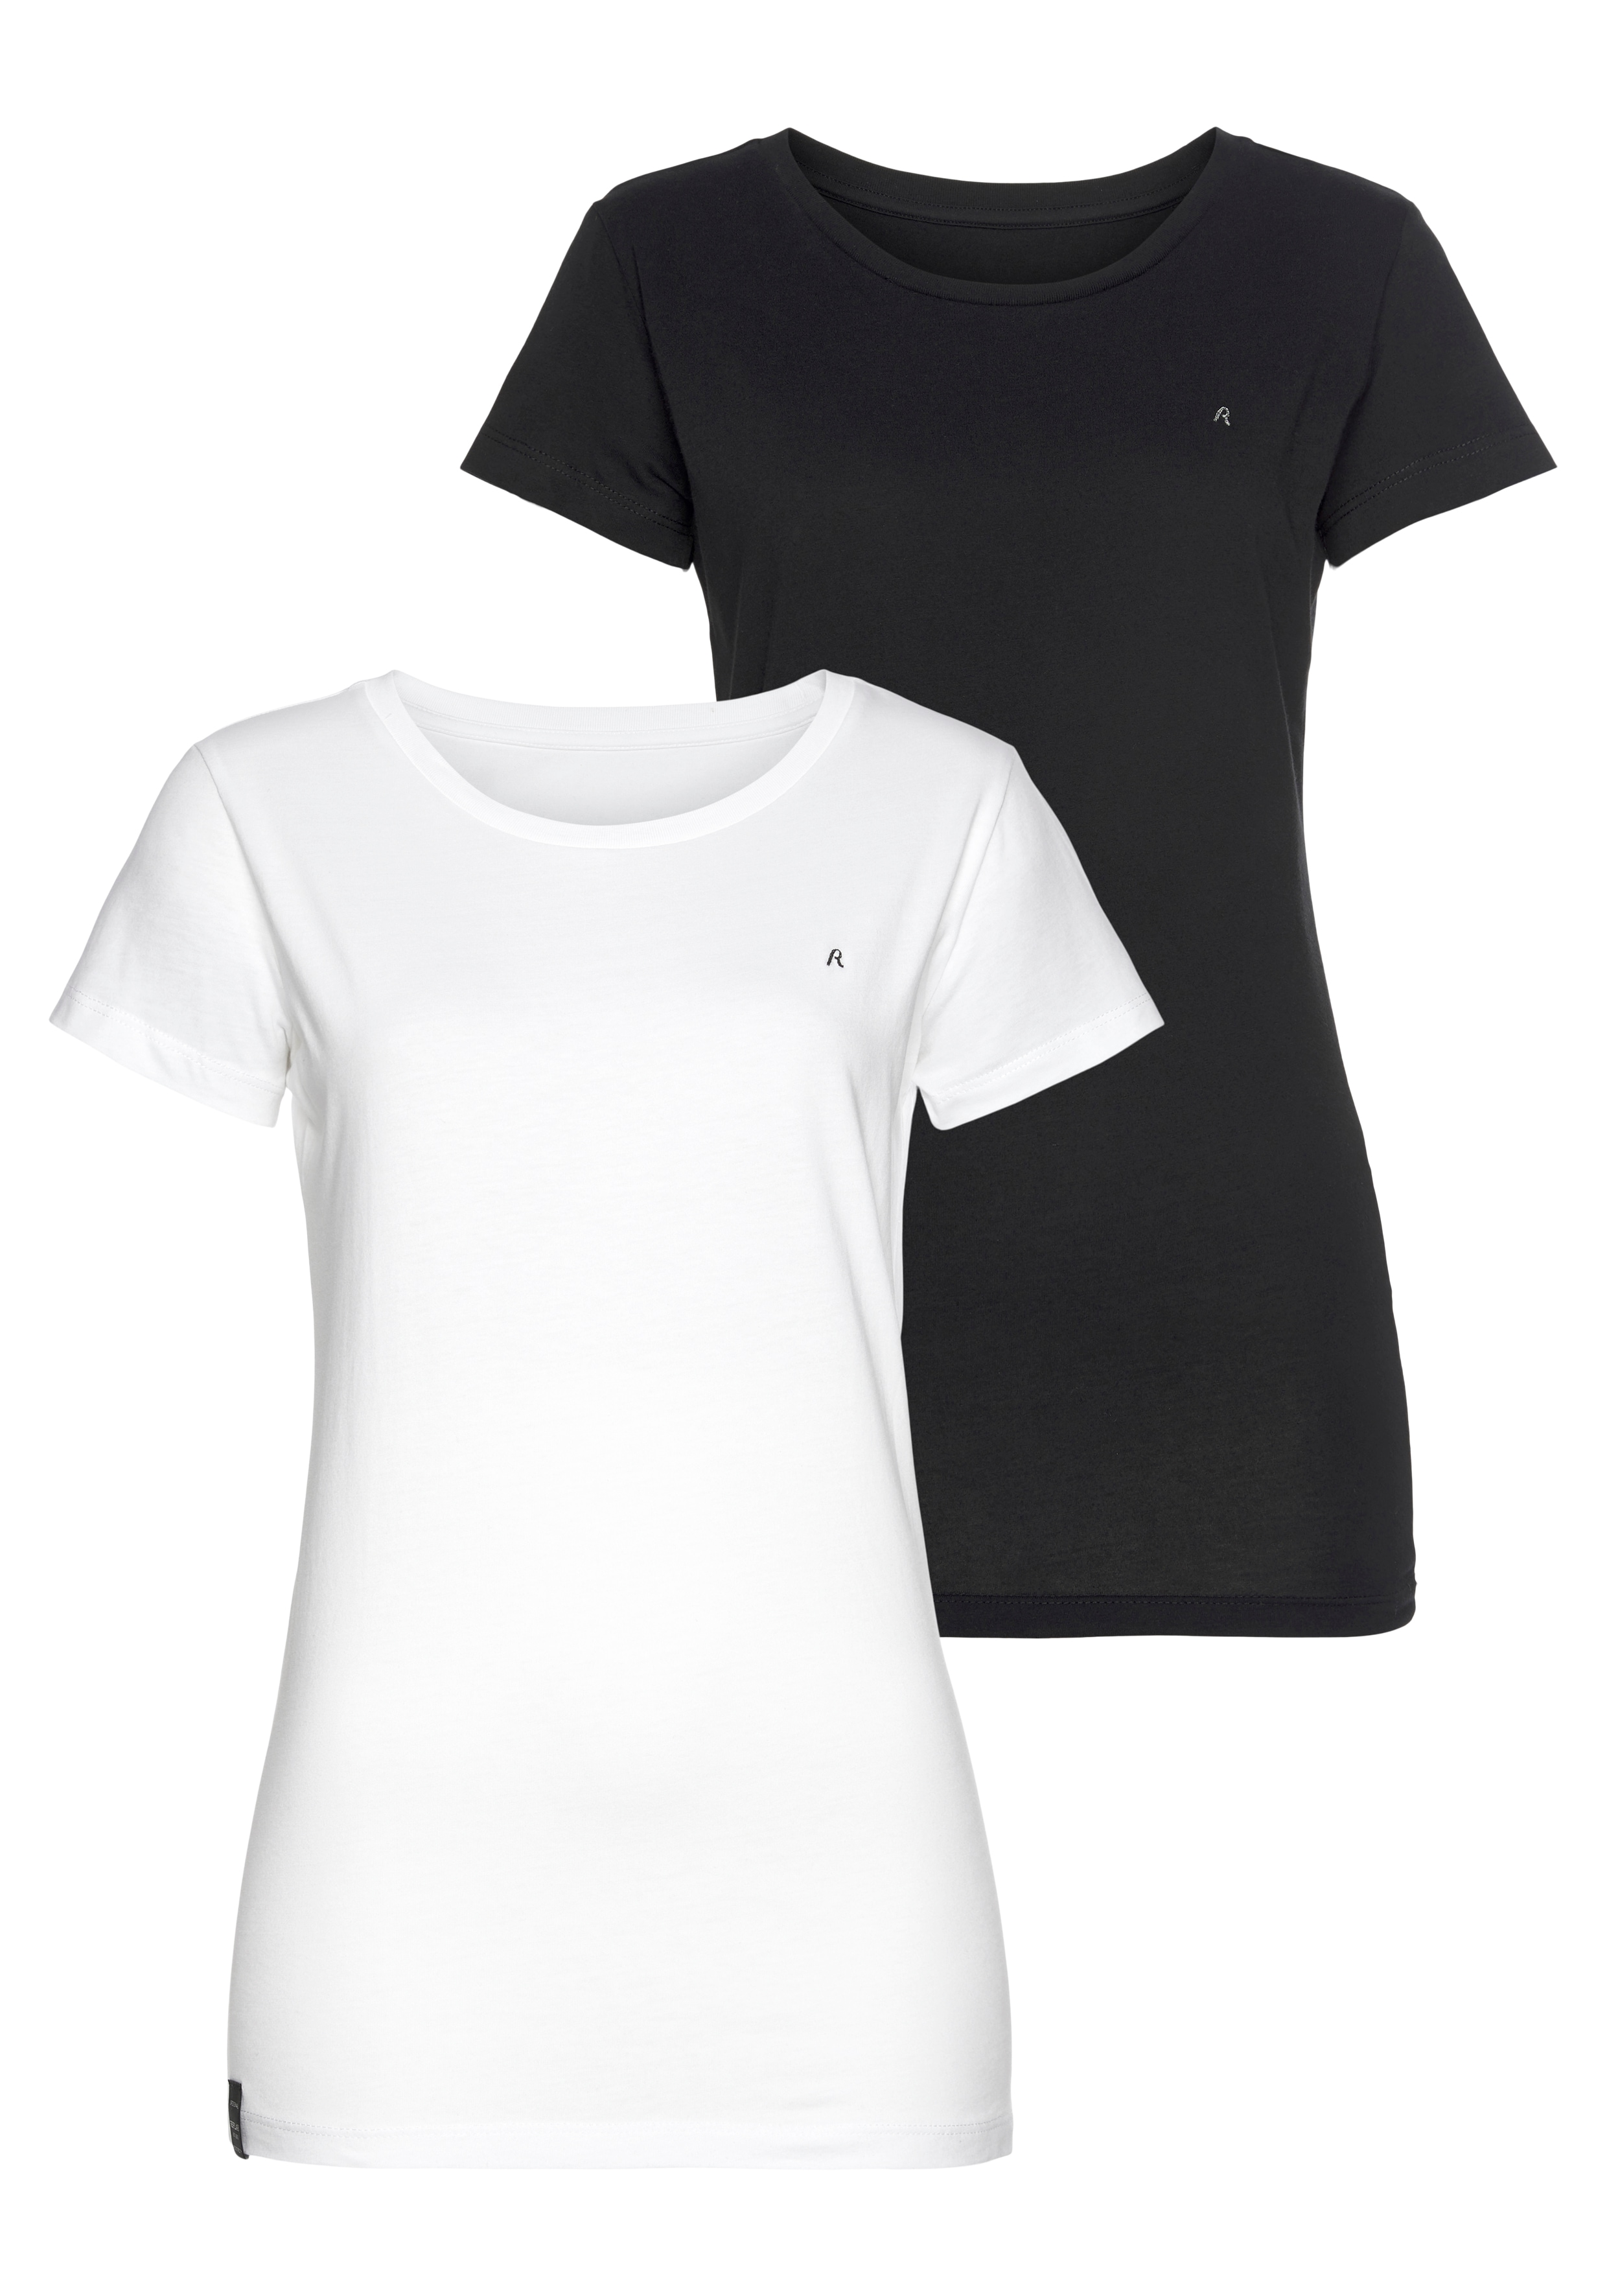 replay -  T-Shirt, mit Rundhalsausschnitt